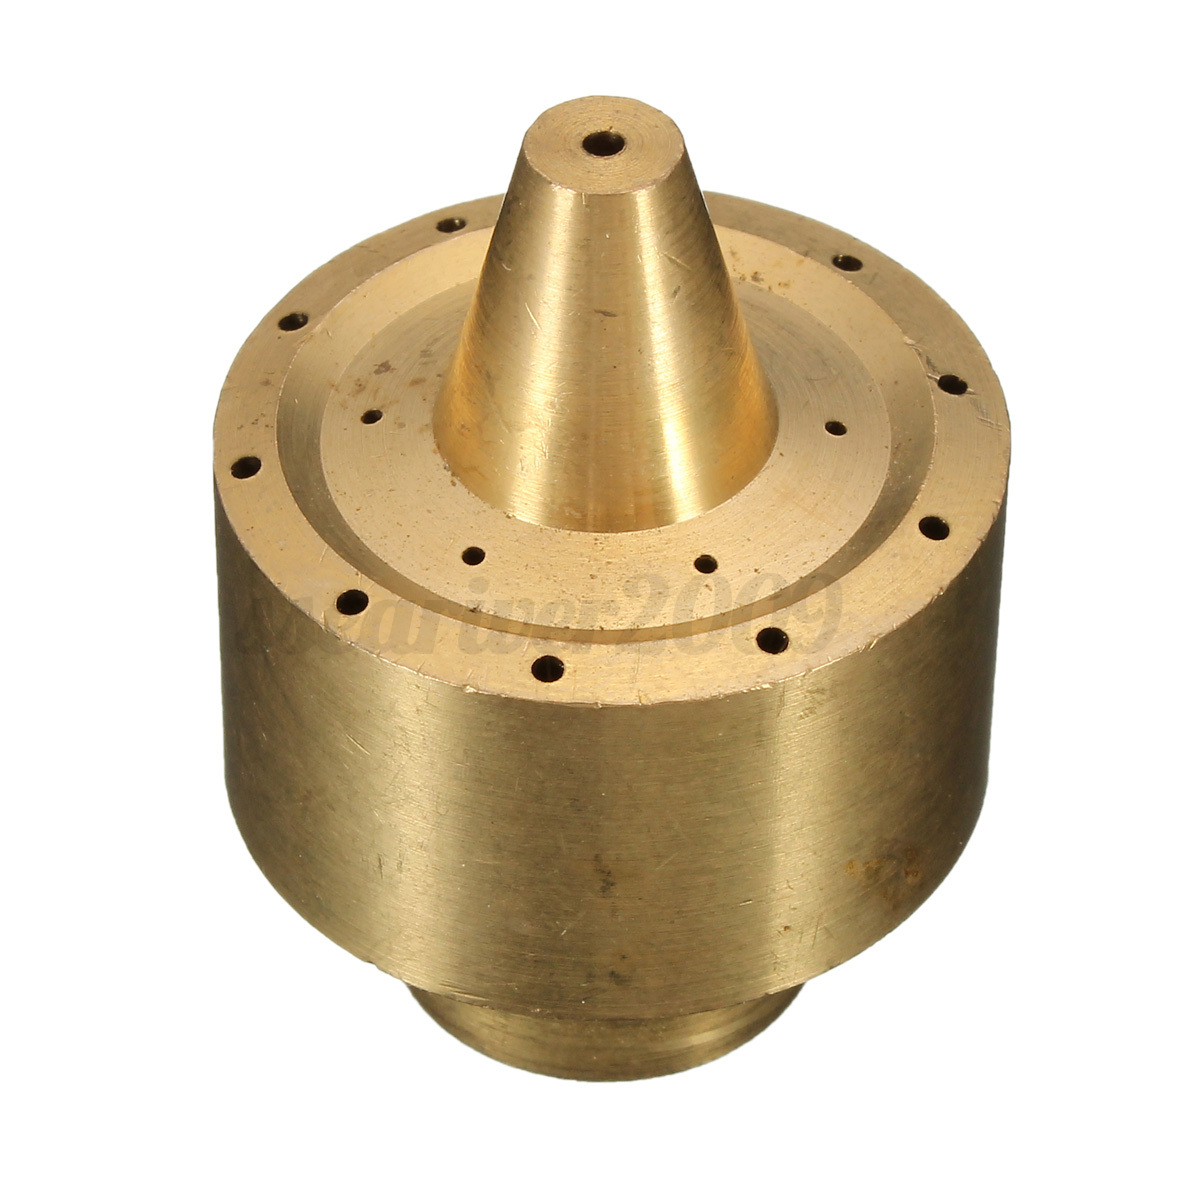 Exterior Sprinkler Heads : Brass column fountain nozzle spray sprinkler head quot